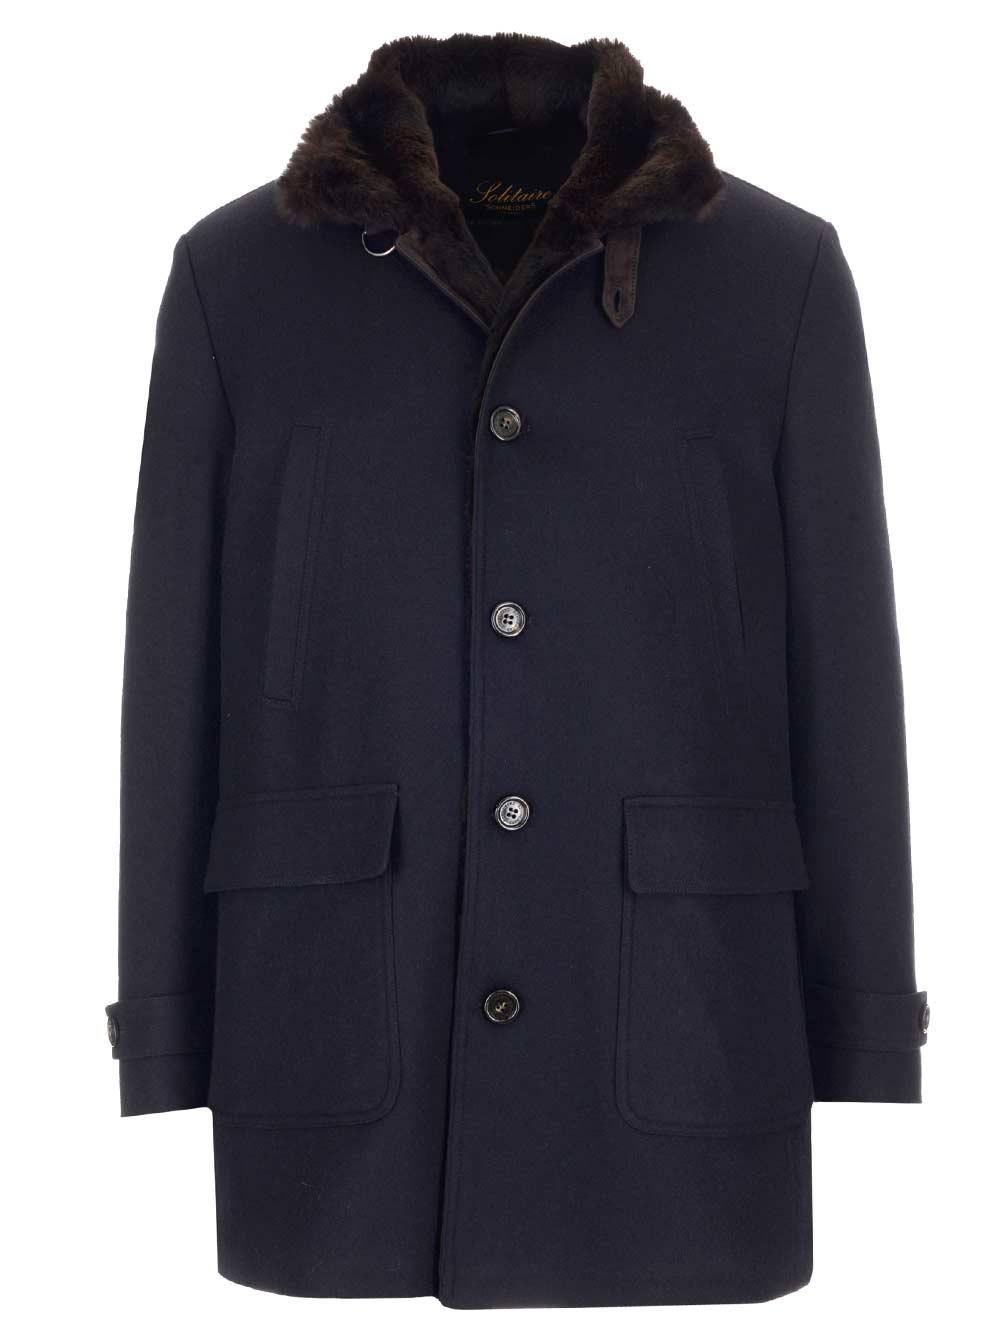 SCHNEIDERS Blue Cachemire Coat With Fur